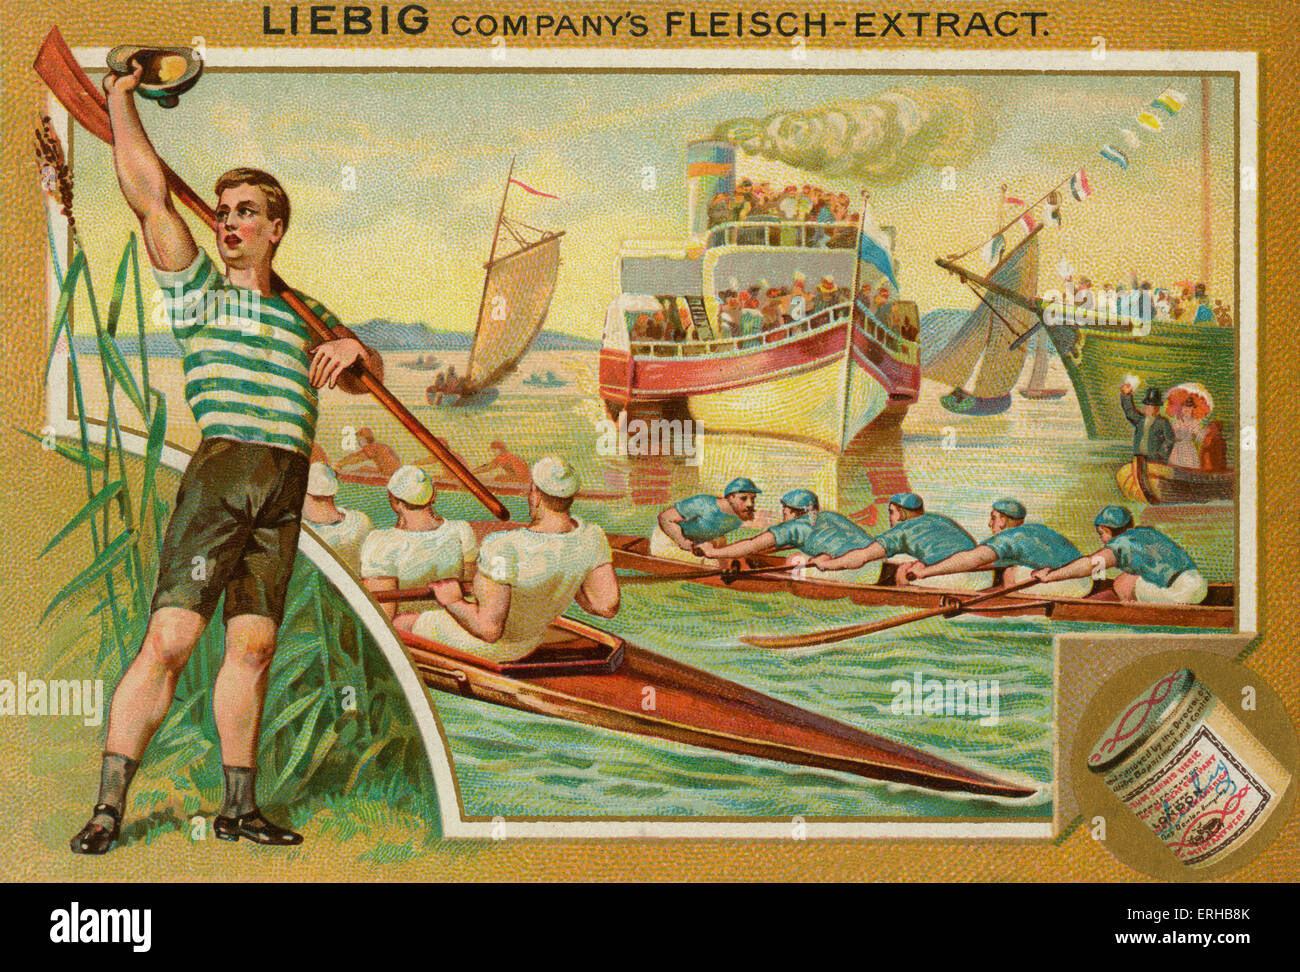 Eine Ruderregatta. Liebig-Karte, Sport, 1896. Stockbild